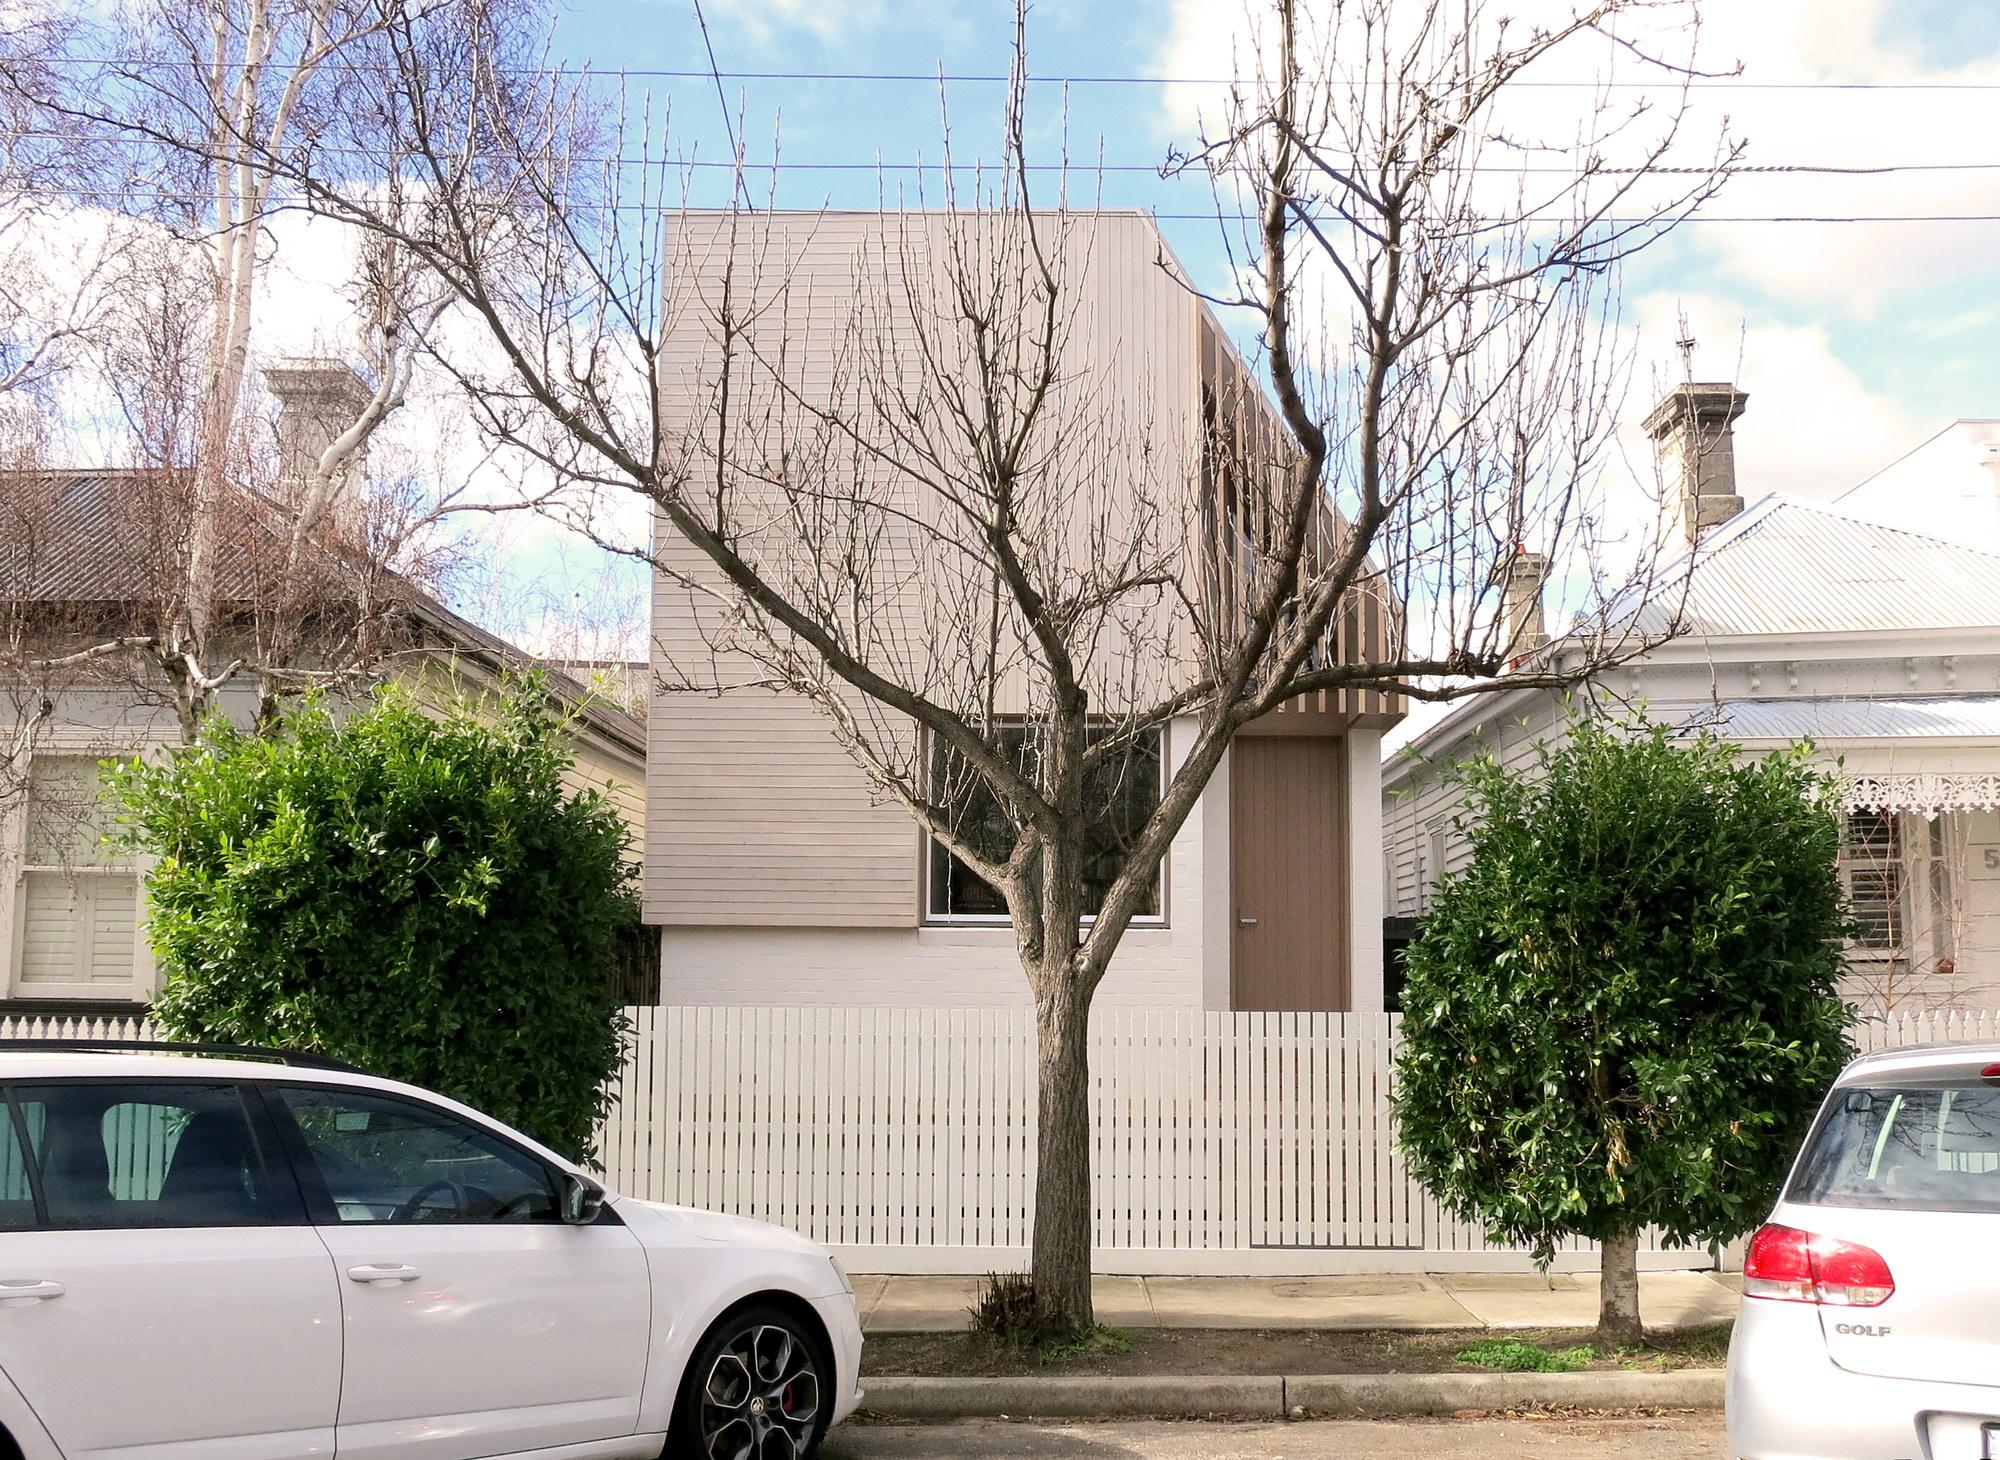 Tess + JJ's House | Narrow House by po-co ArchitectureTess + JJ's House | Narrow House by po-co Architecture